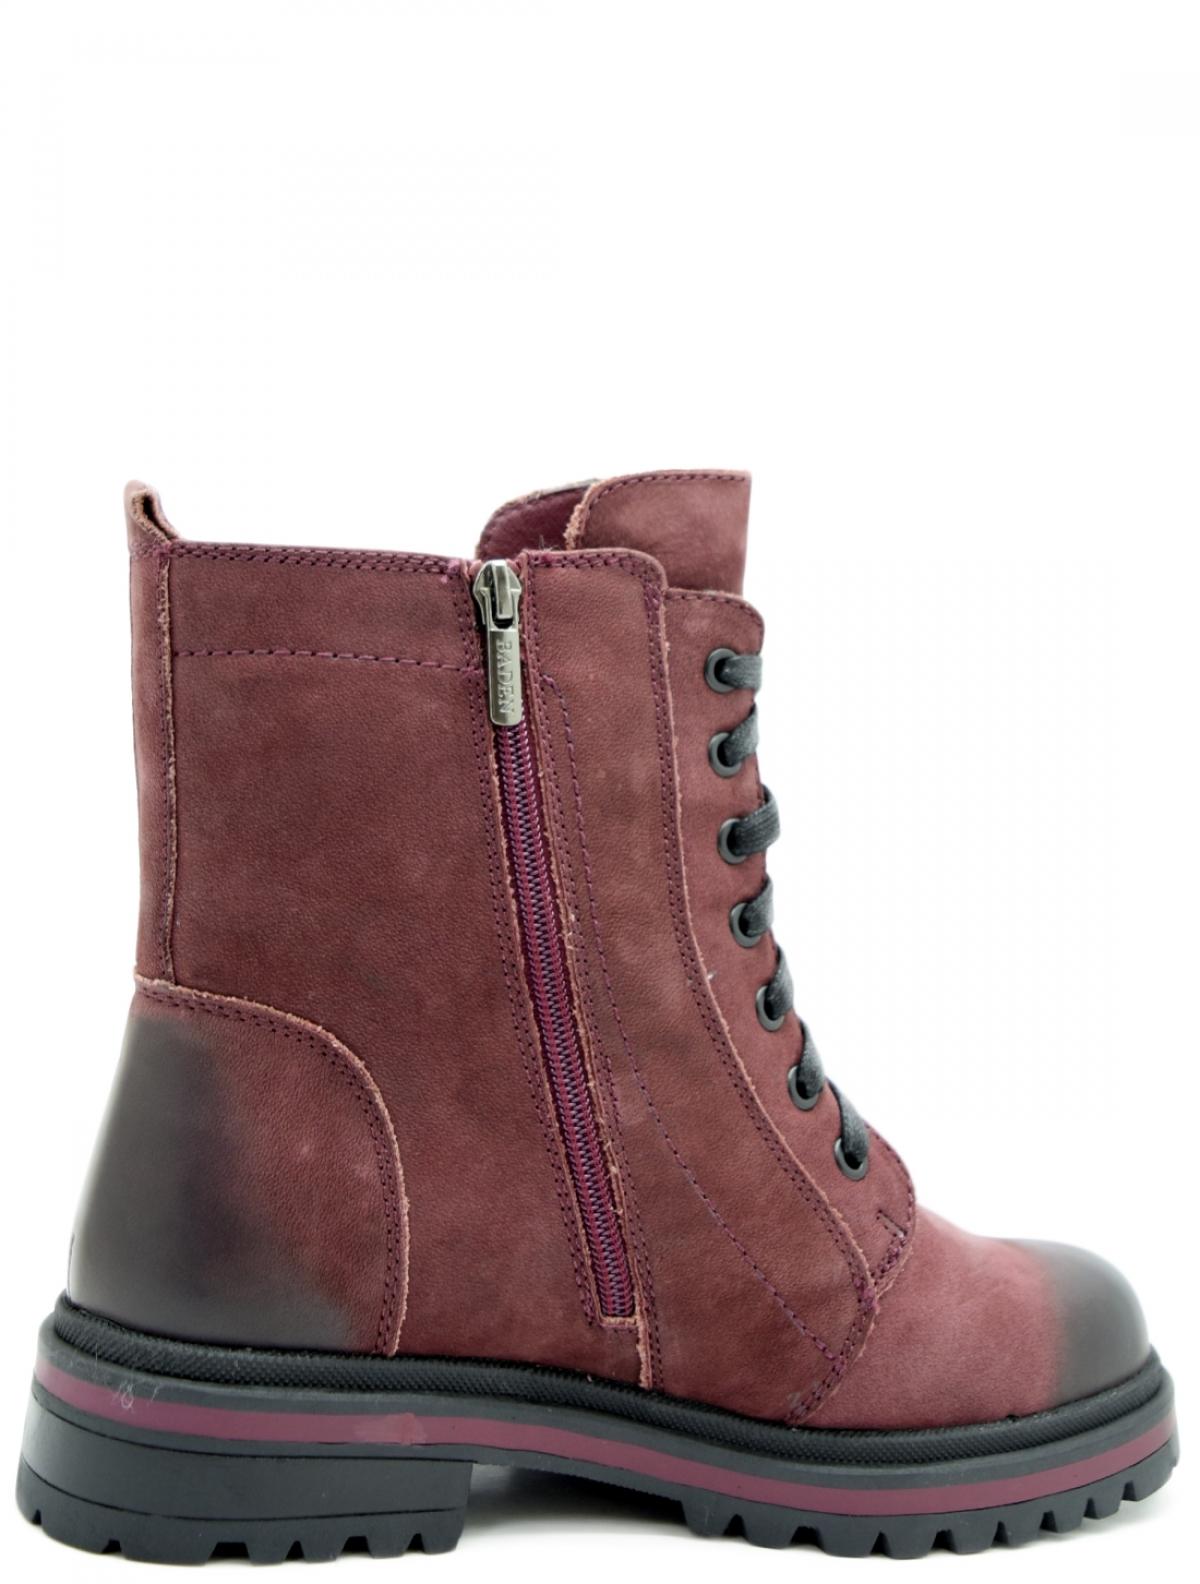 Baden U146-011 женские ботинки